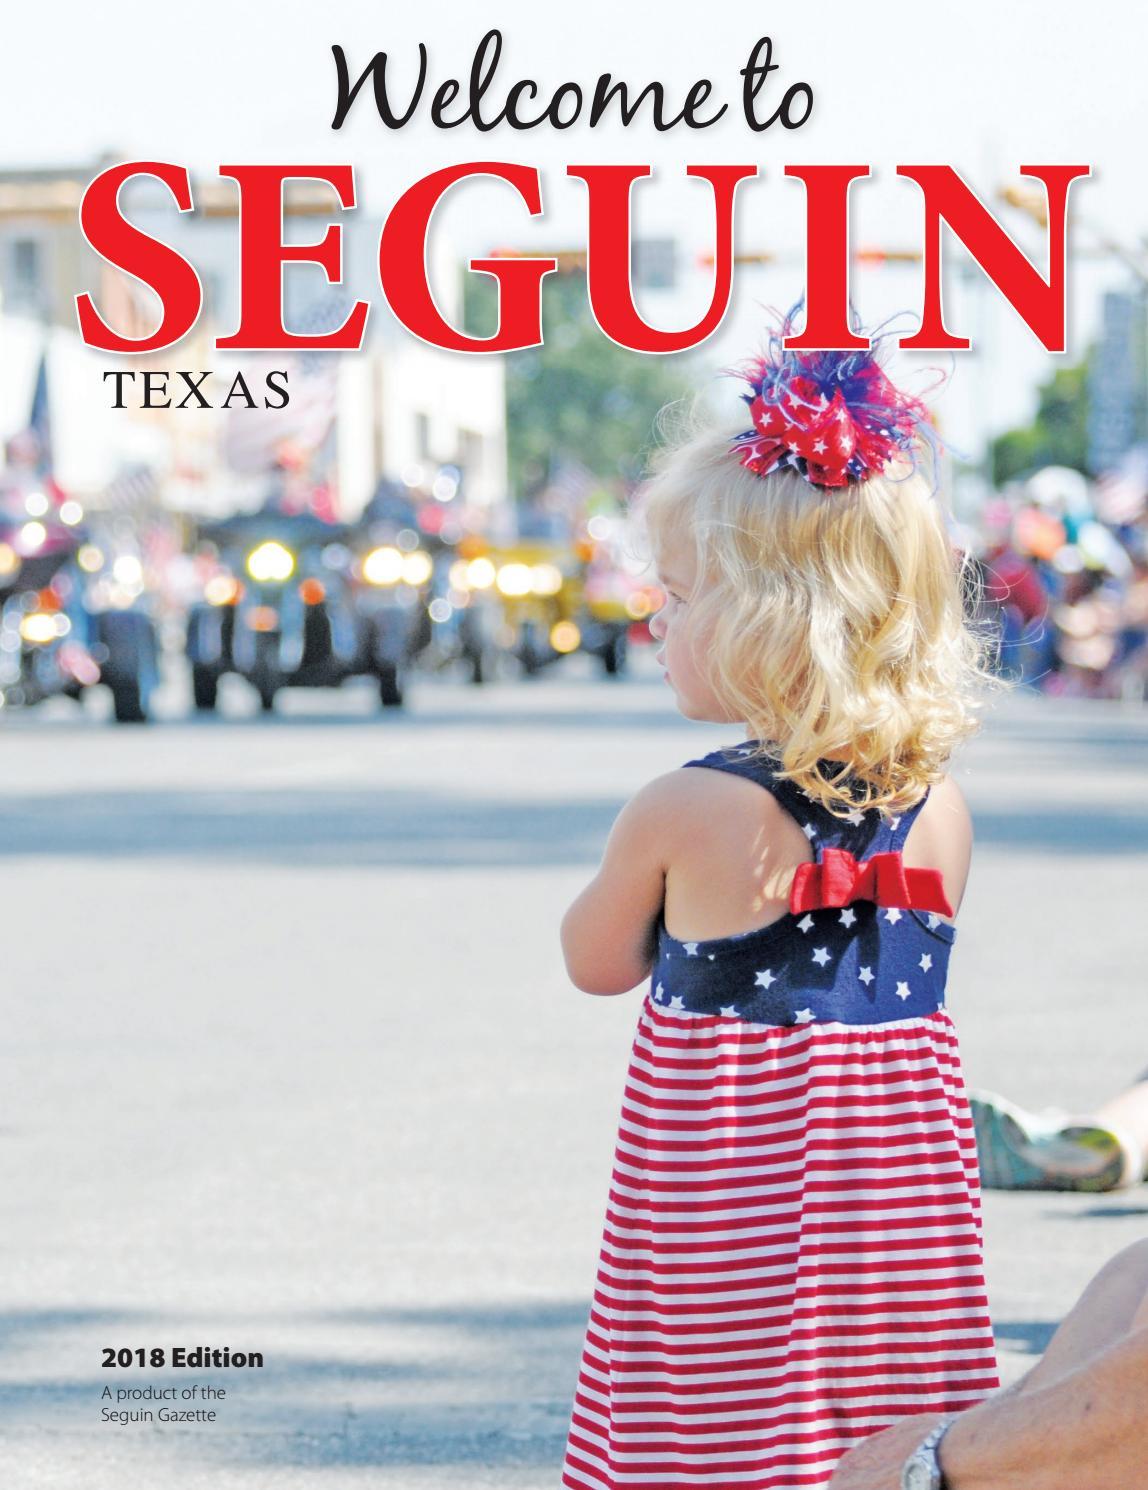 147faa1b17d5 Welcome to Seguin 2018 by Seguin Gazette - issuu